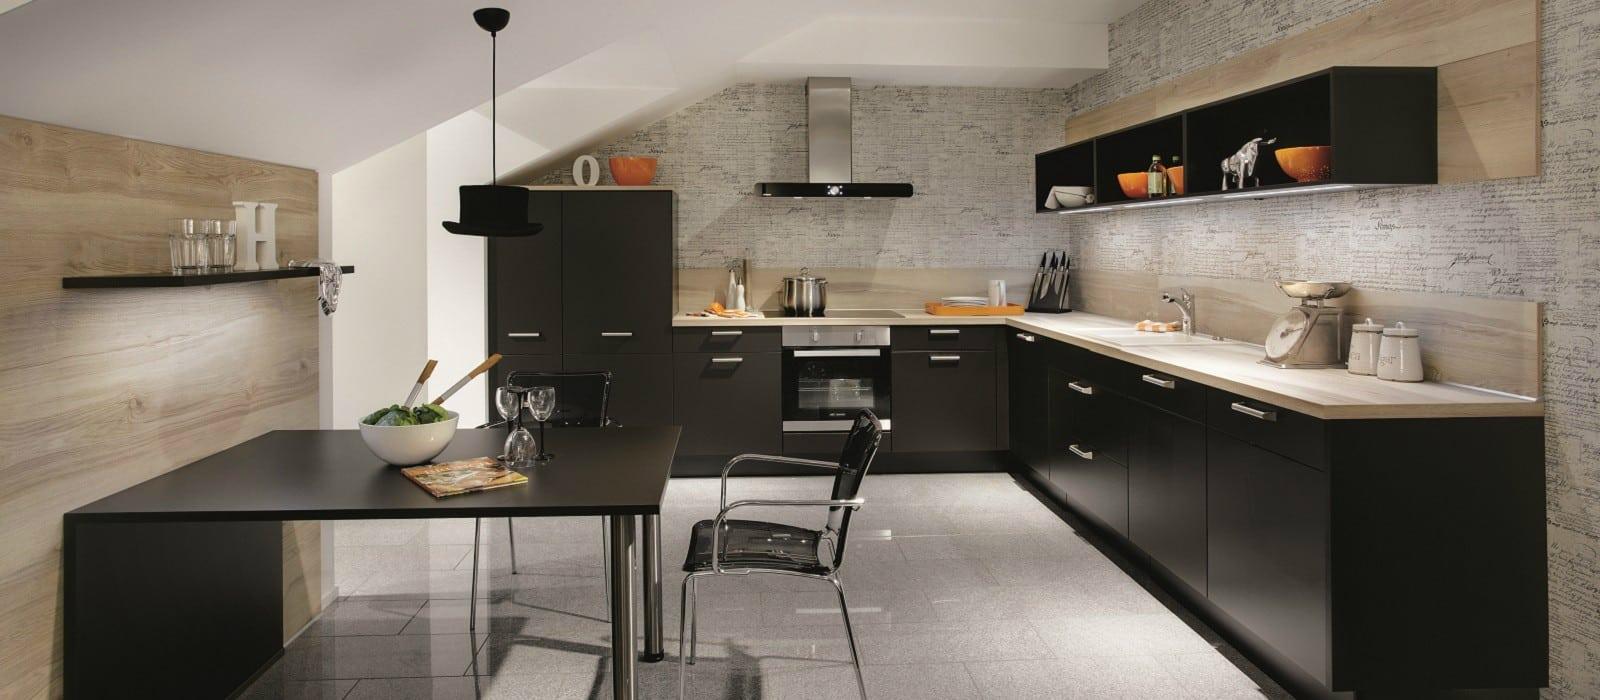 renover sa cuisine en bois top renover sa cuisine rustique cuisine rustique with renover sa. Black Bedroom Furniture Sets. Home Design Ideas